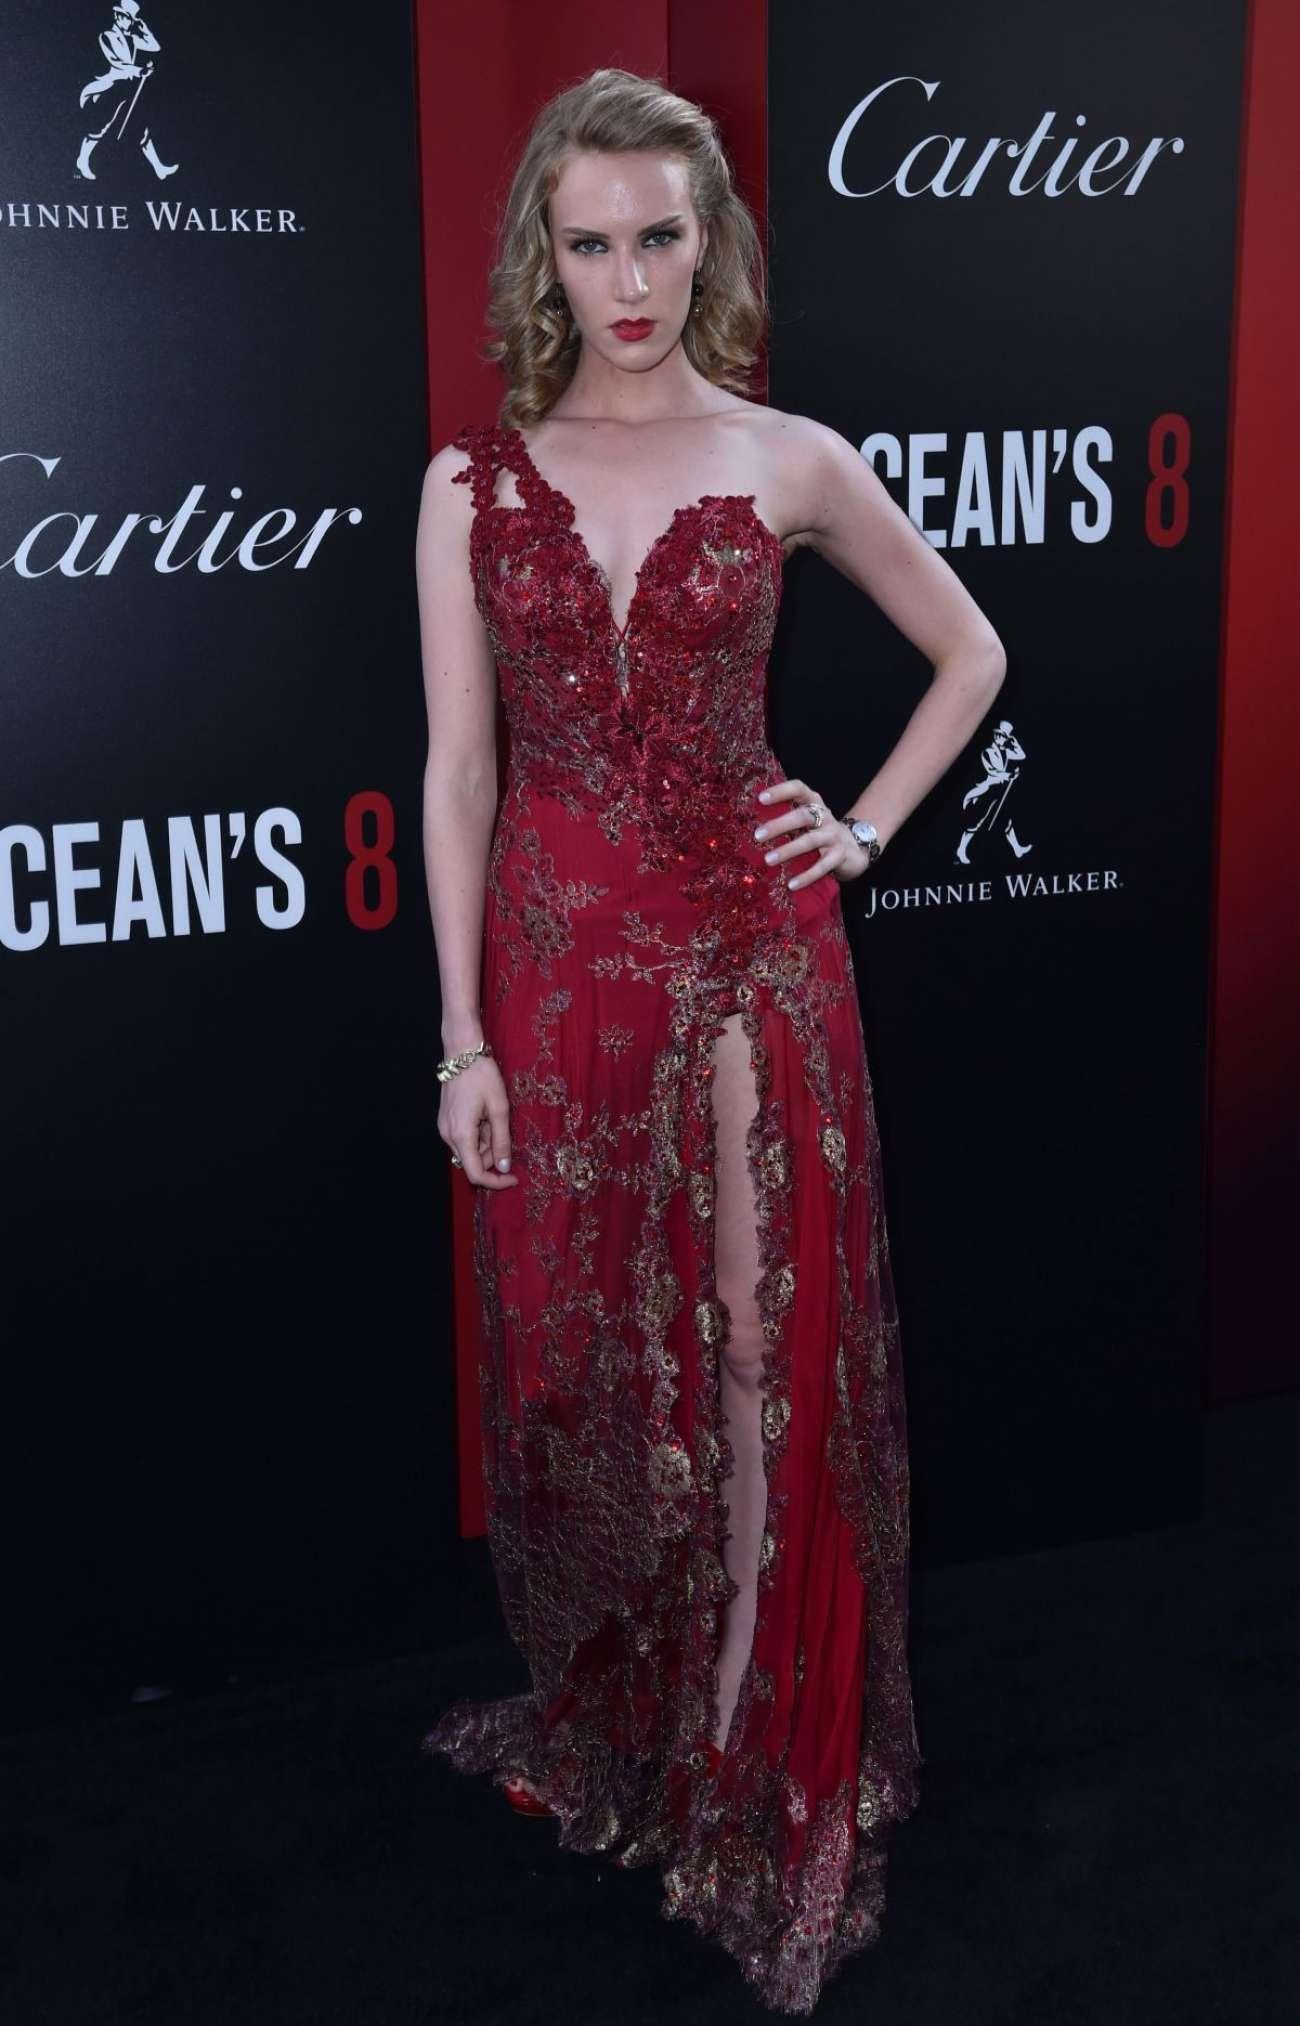 Charlotte Kirk 2018 : Charlotte Kirk: Ocean's 8 Premiere photocall In New York-04